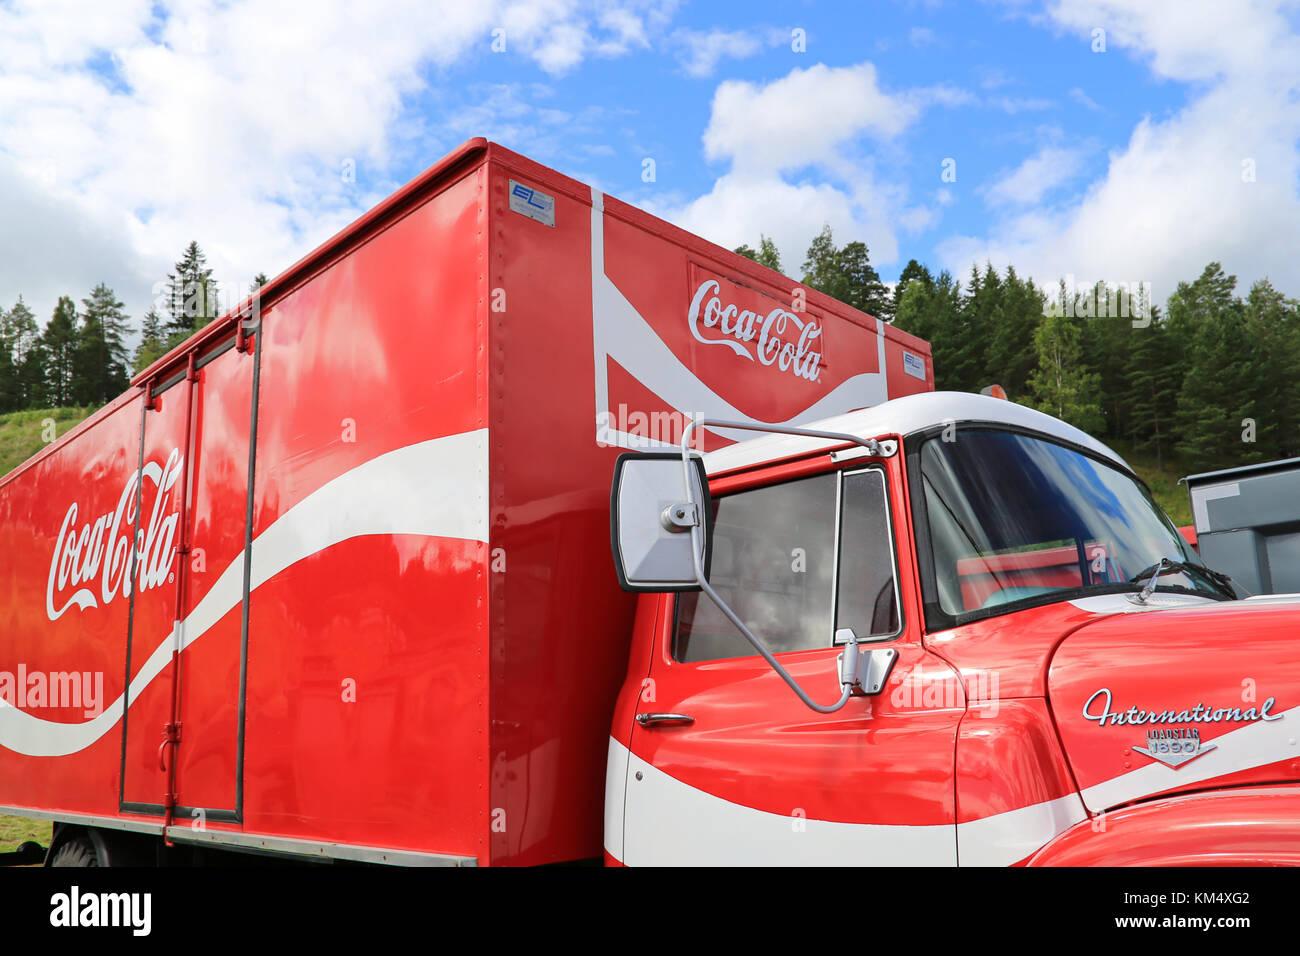 HAMEENLINNA, FINLAND – JULY 11, 2015:  International Loadstar 1890 vintage Coca-Cola truck at Tawastia Truck Weekend Stock Photo